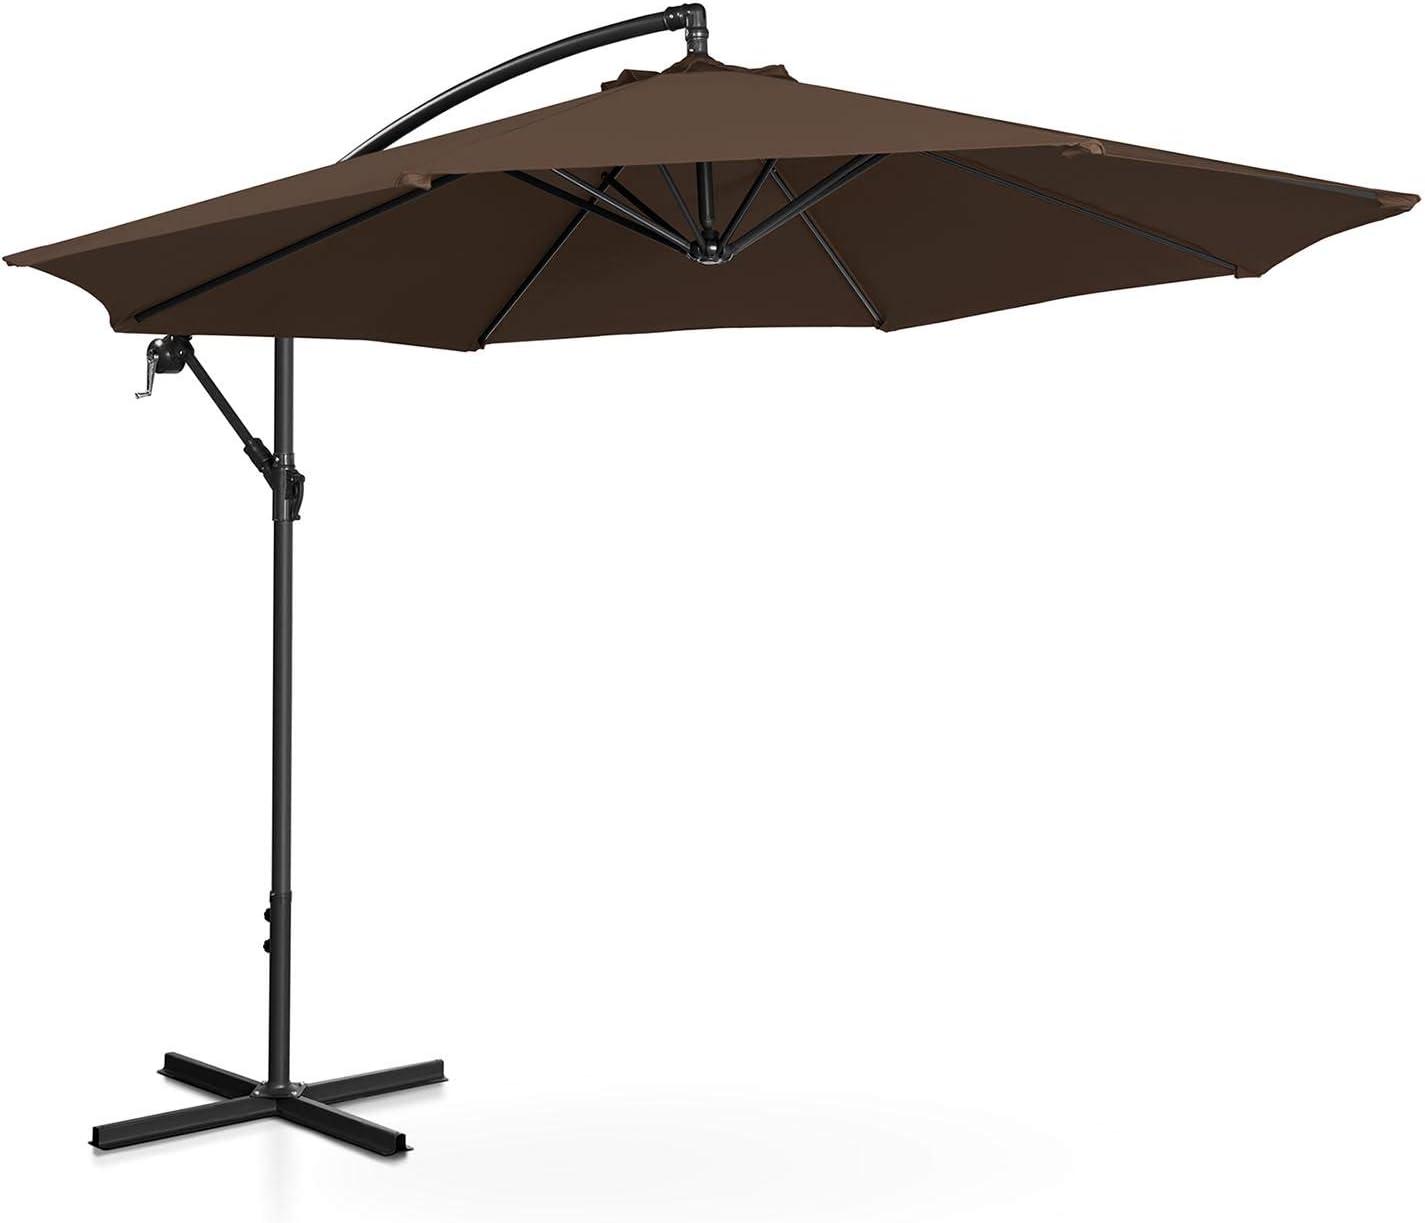 Uniprodo Sombrilla Tipo Semáforo Parasol Colgante Uni_Umbrella_R300BR (Pantalla Redonda, Diámetro 300 cm, Inclinable, Color Marrón)